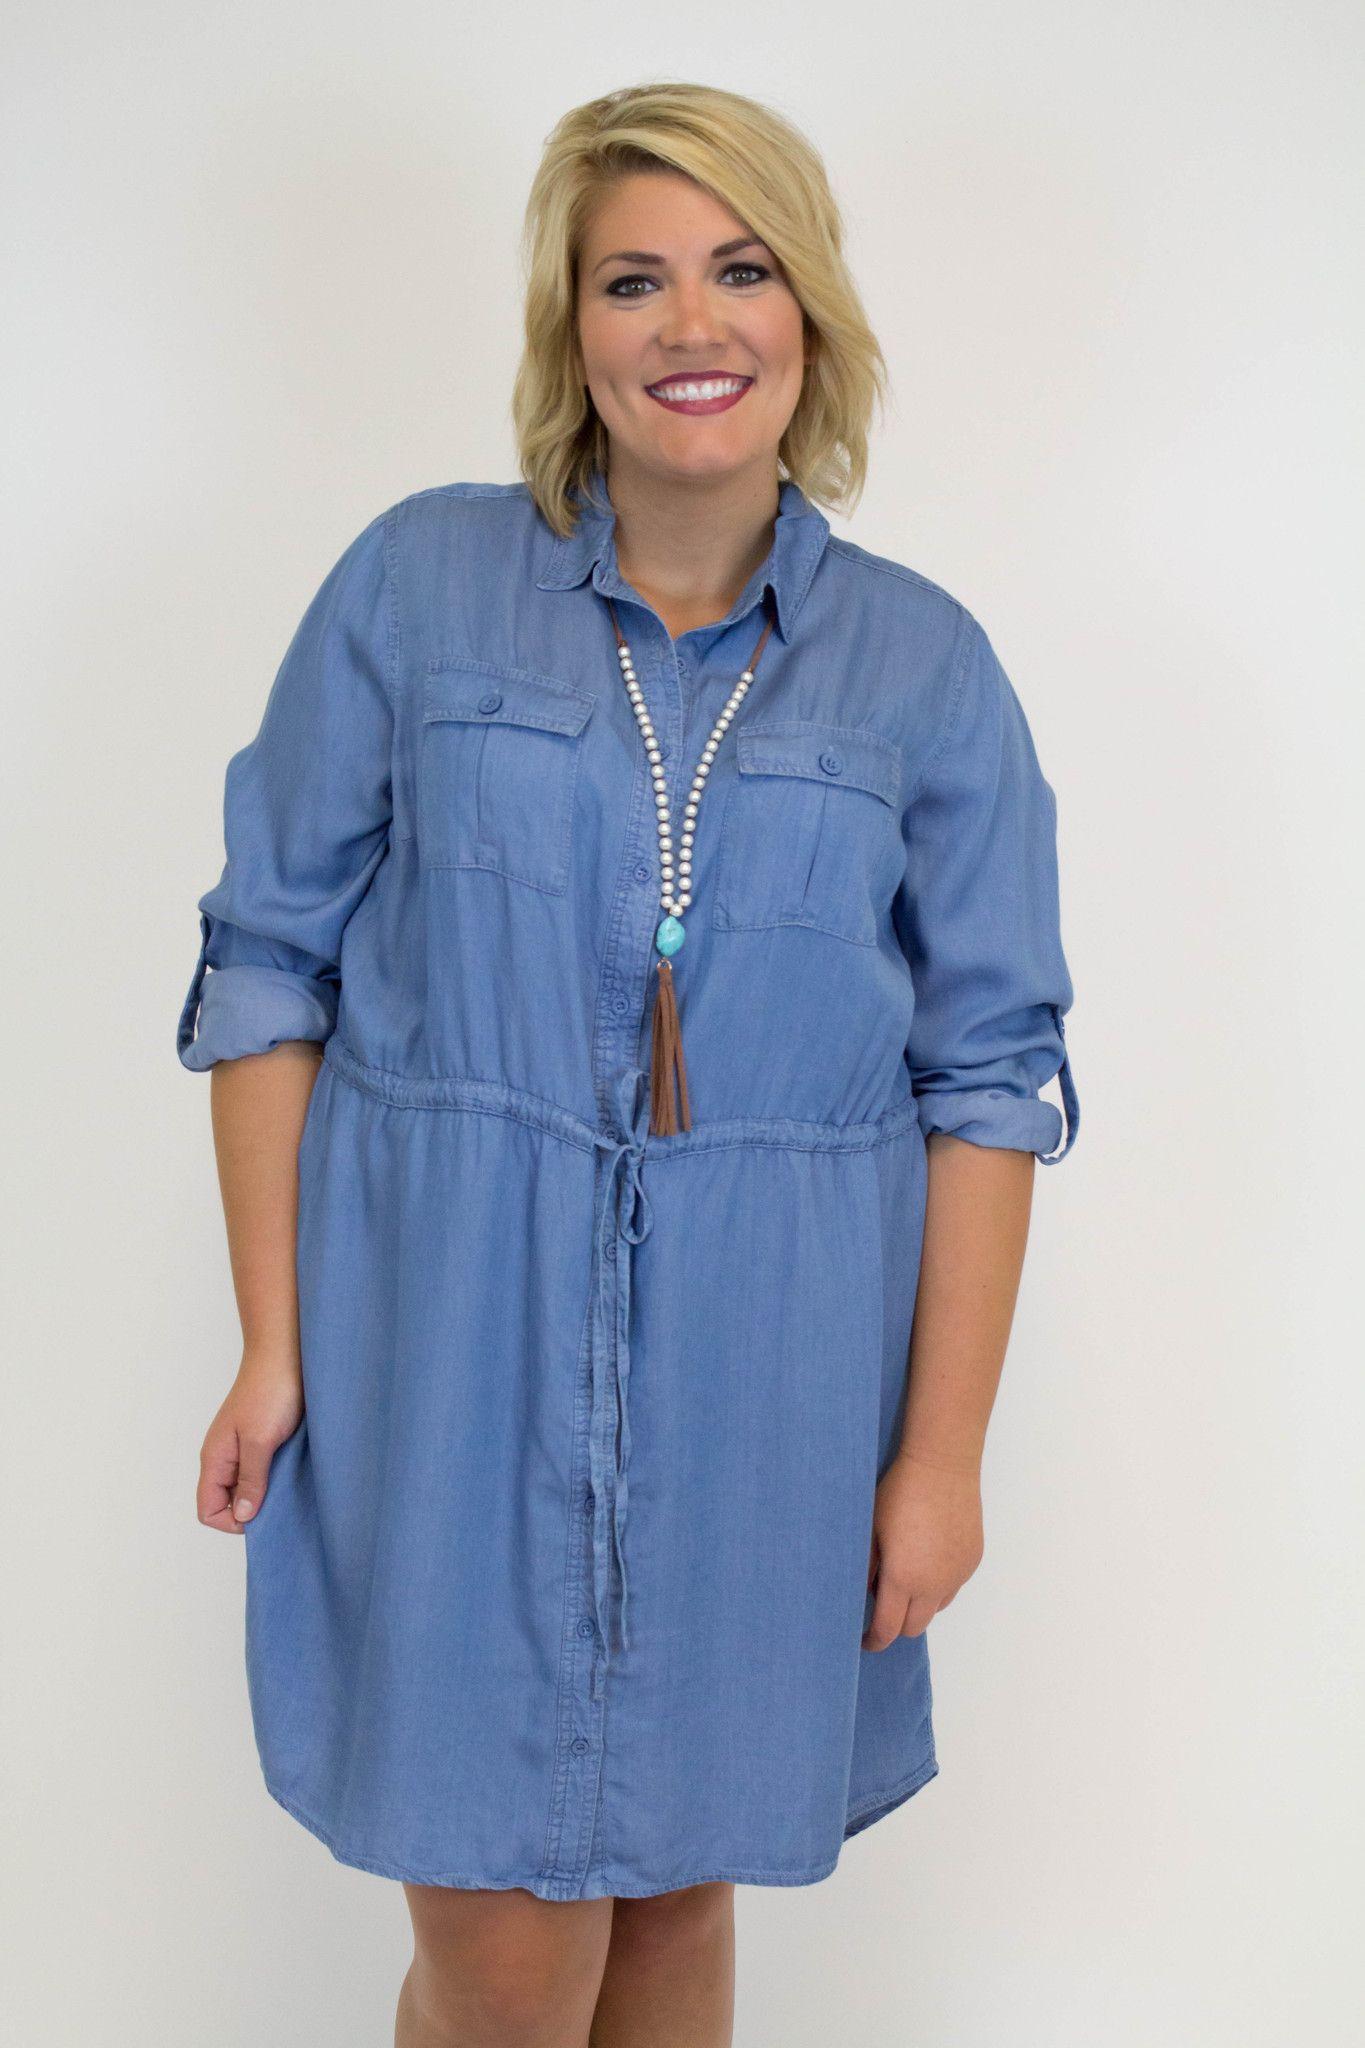 cd0961c8440ed7 Denim Dress - Plus Size | Bold and beautiful | Dresses, Plus size ...